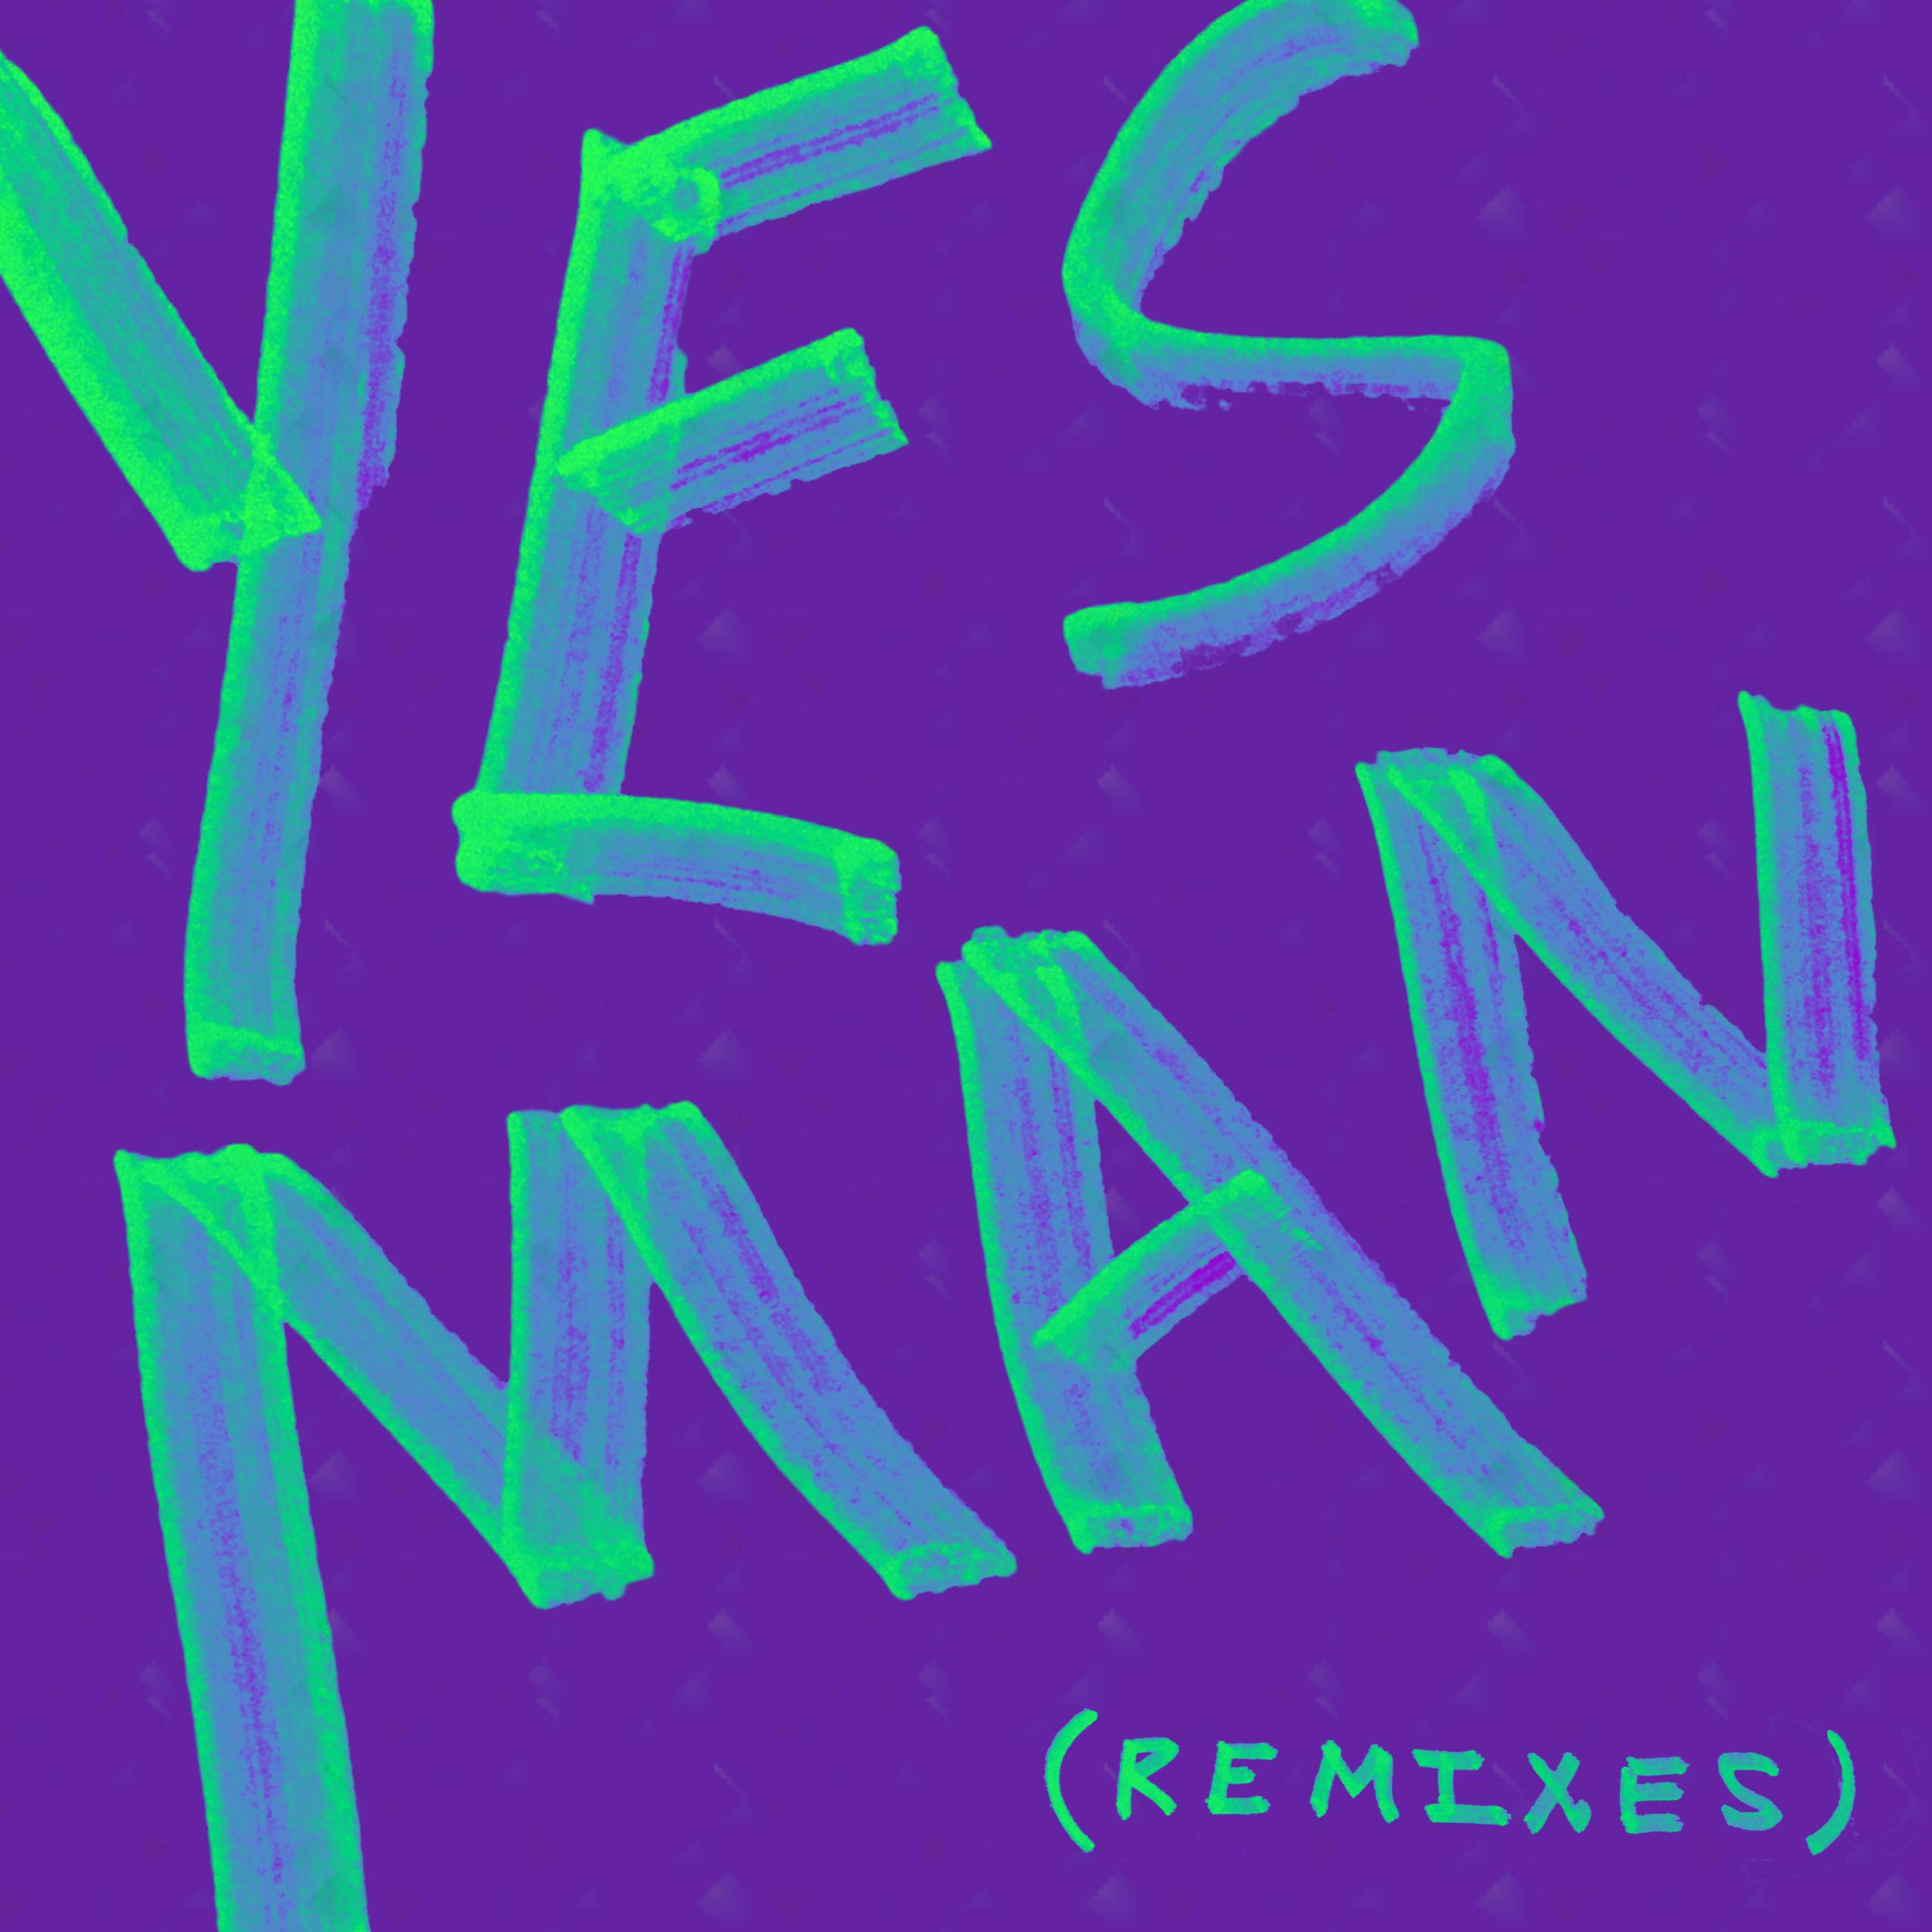 Yes Man Remix Artwork3000x3000.png